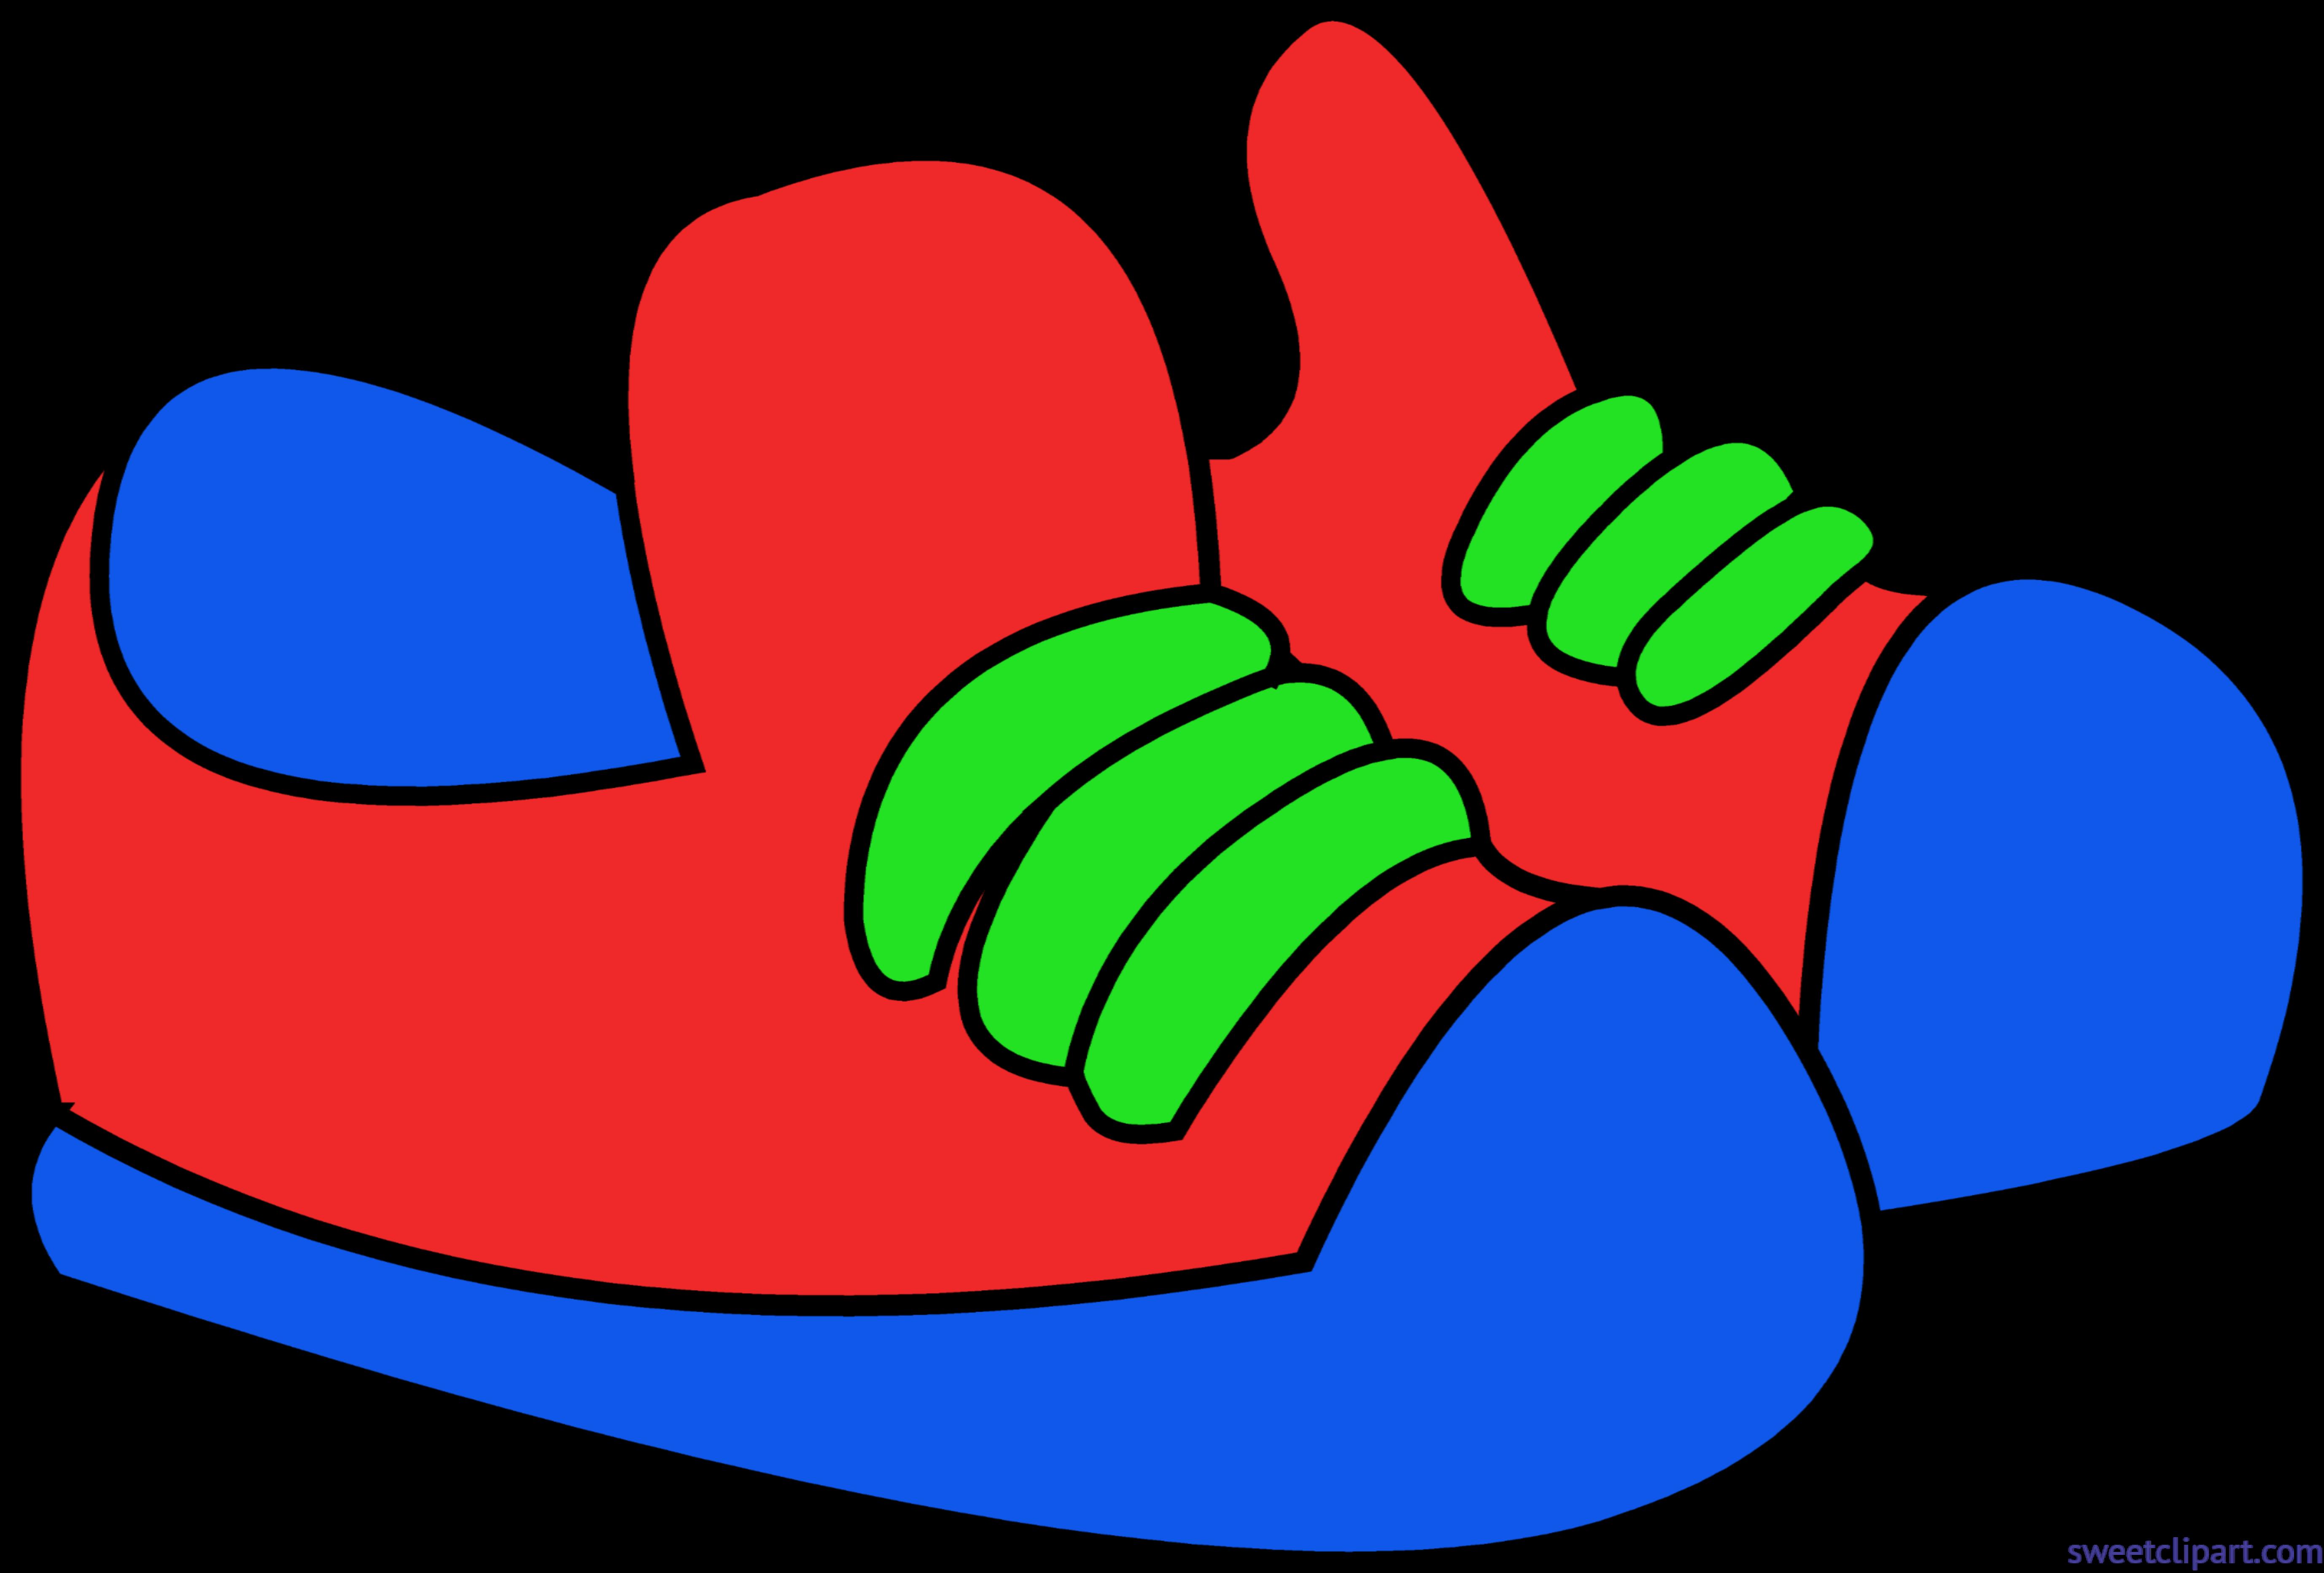 Kids shoes red blue. Heels clipart cinderella shoe